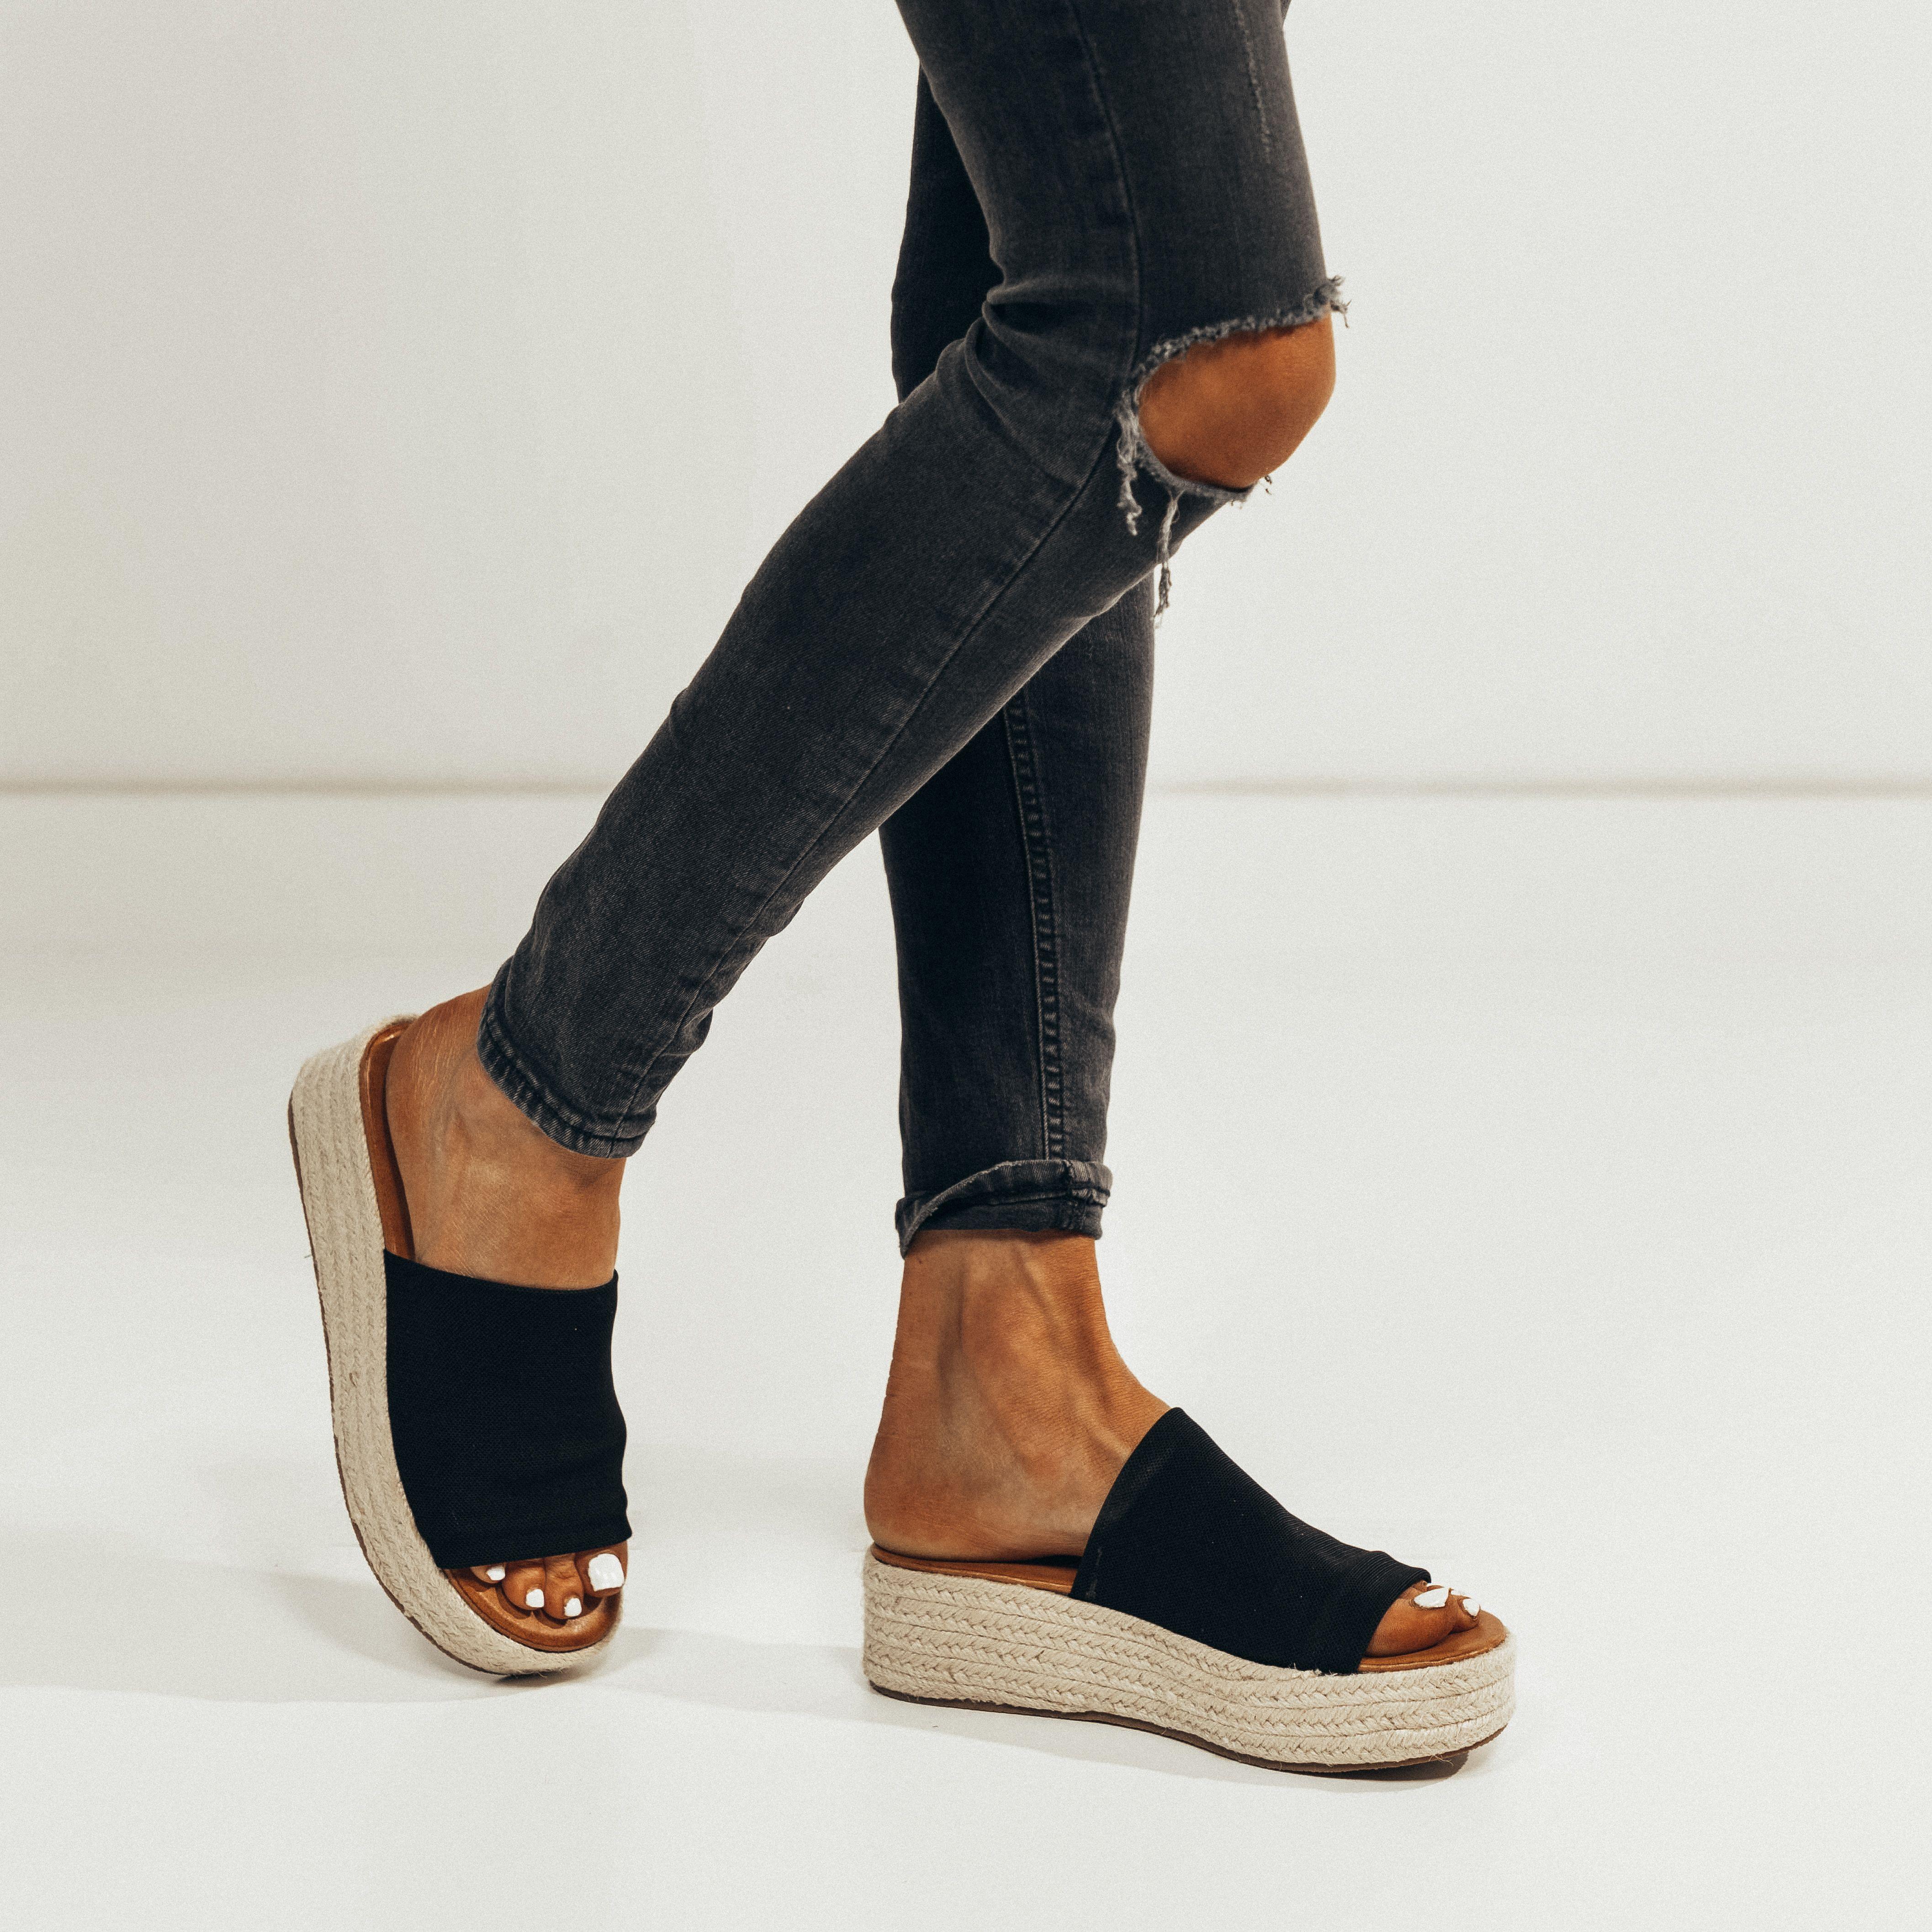 b576fcb92b27c 2018 summer sandal platform shoe wedge // shop stevie hender | Adorn ...